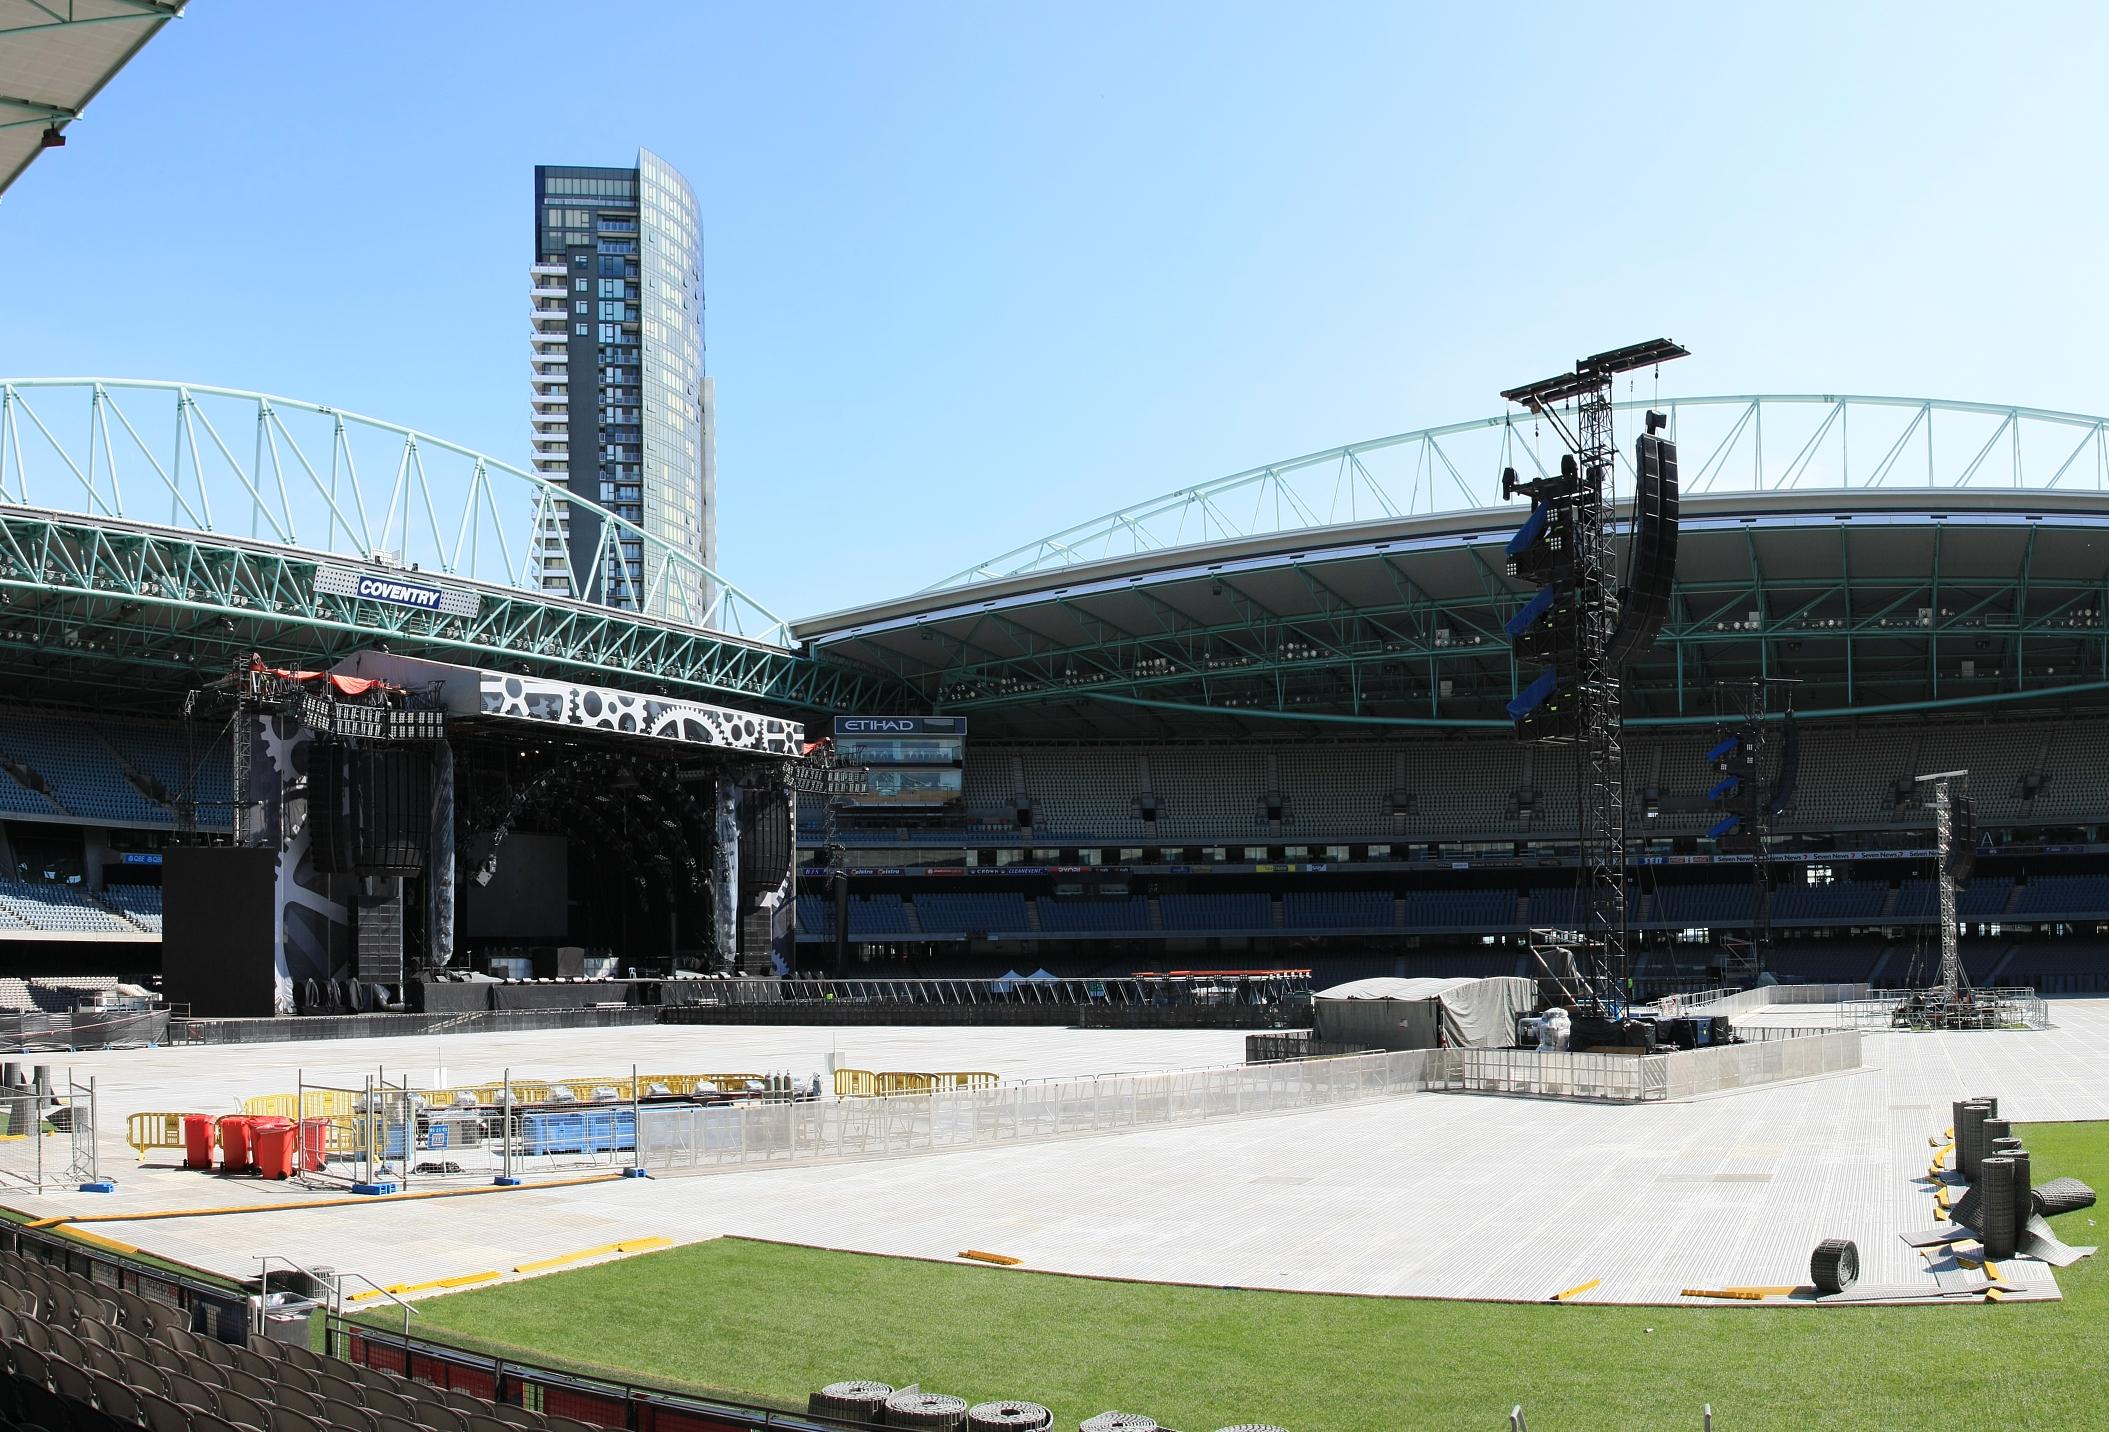 File:ACDC stage set up etihad stadium melbourne 14th feb.jpg - Wikimedia  Commons